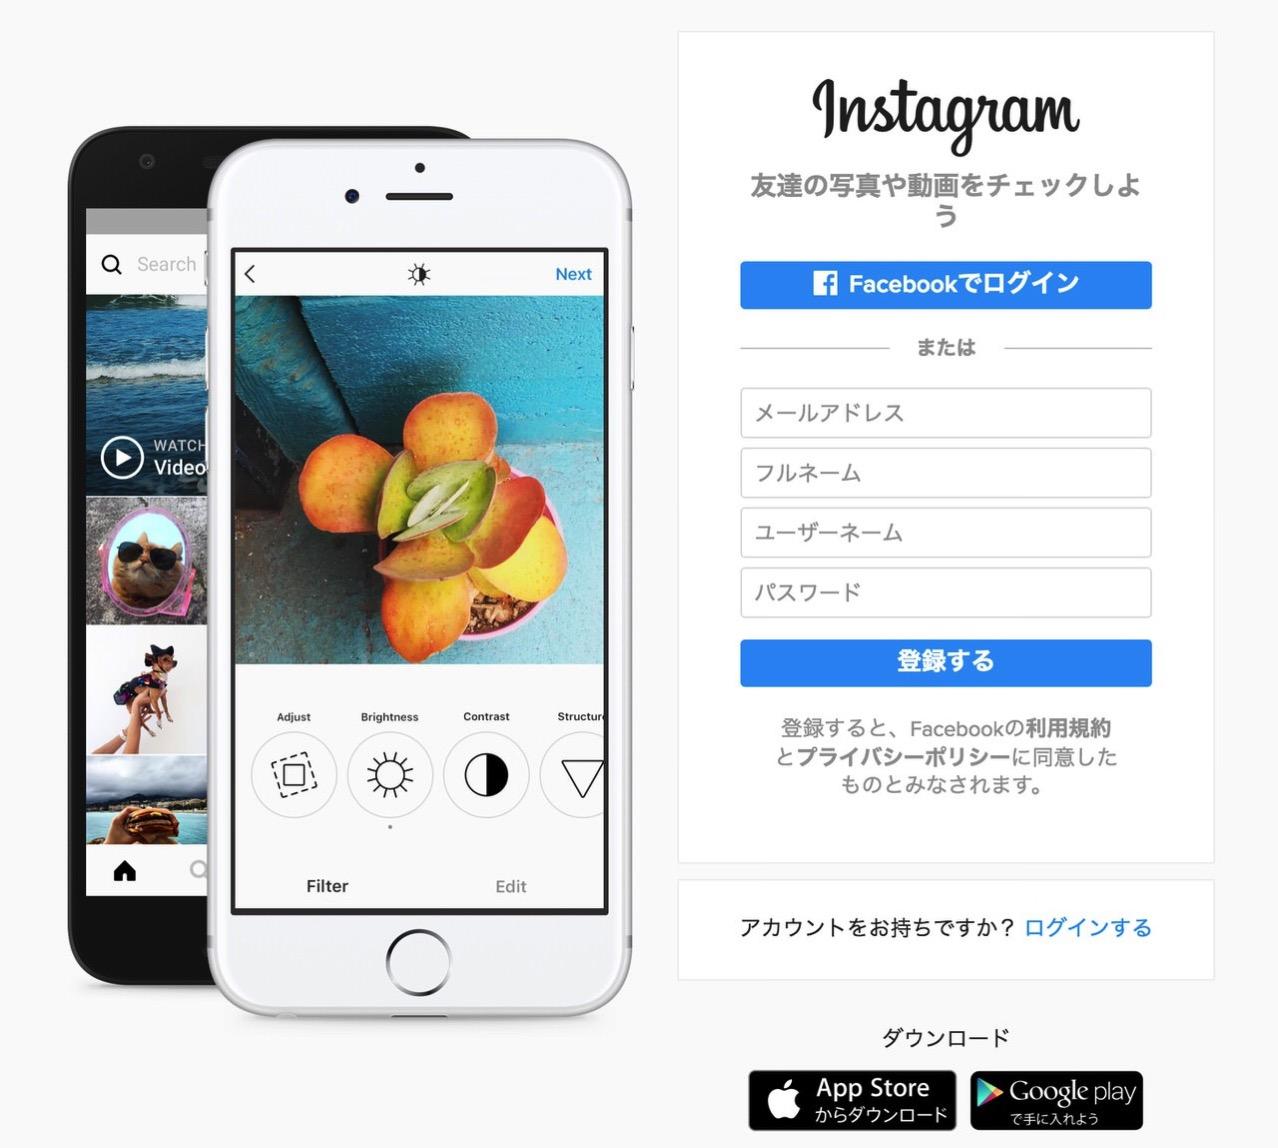 「Instagram」表示のアルゴリズム変更 → 時系列ではなく興味を基準に